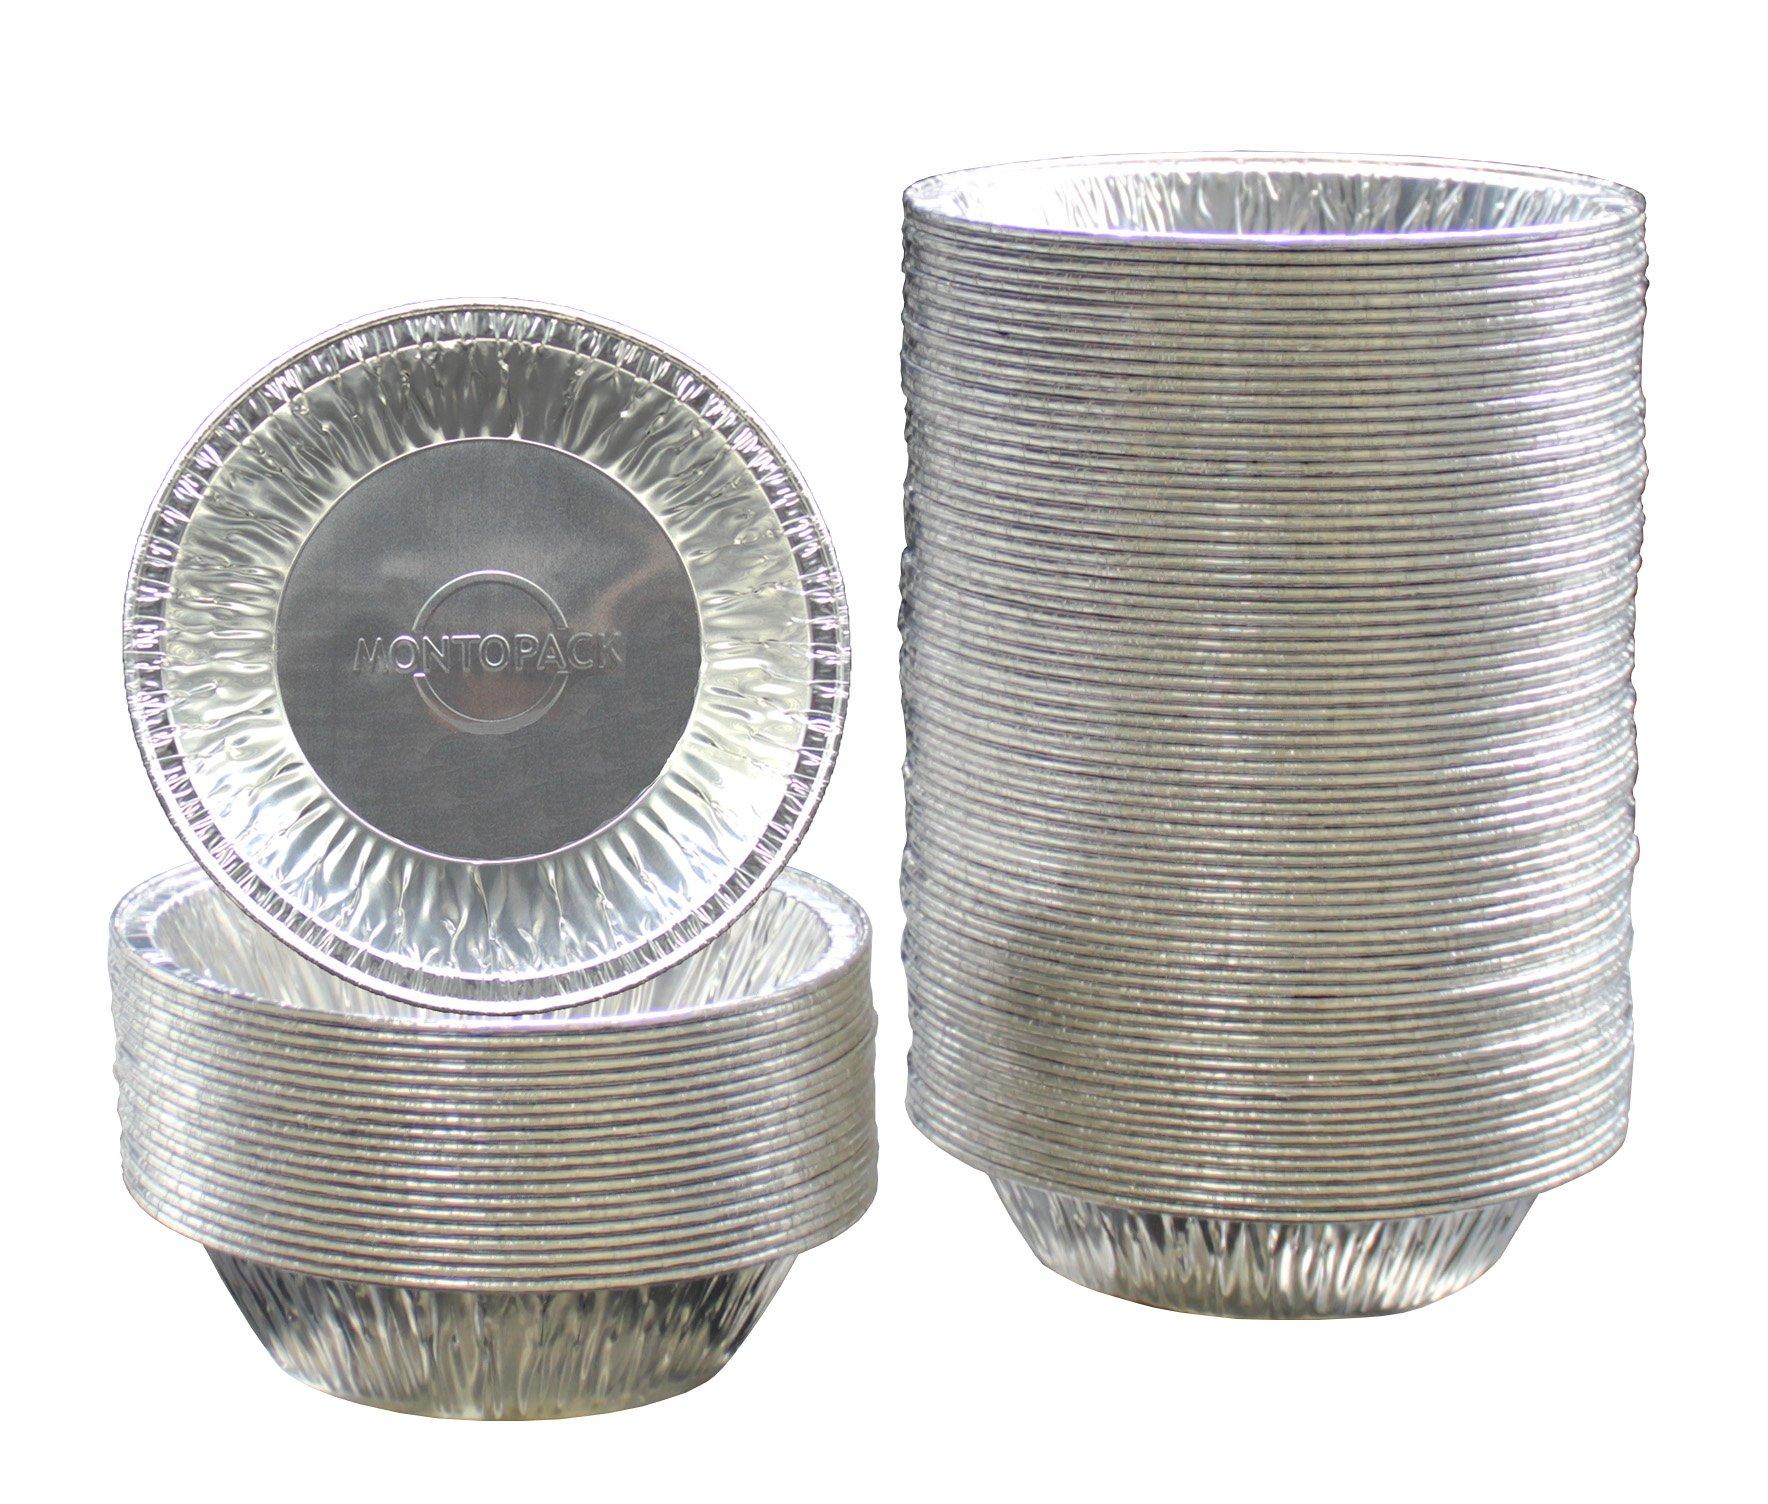 MontoPack Disposable 5'' Aluminum Foil Tart/Pie Tins Pans (100 Pack)